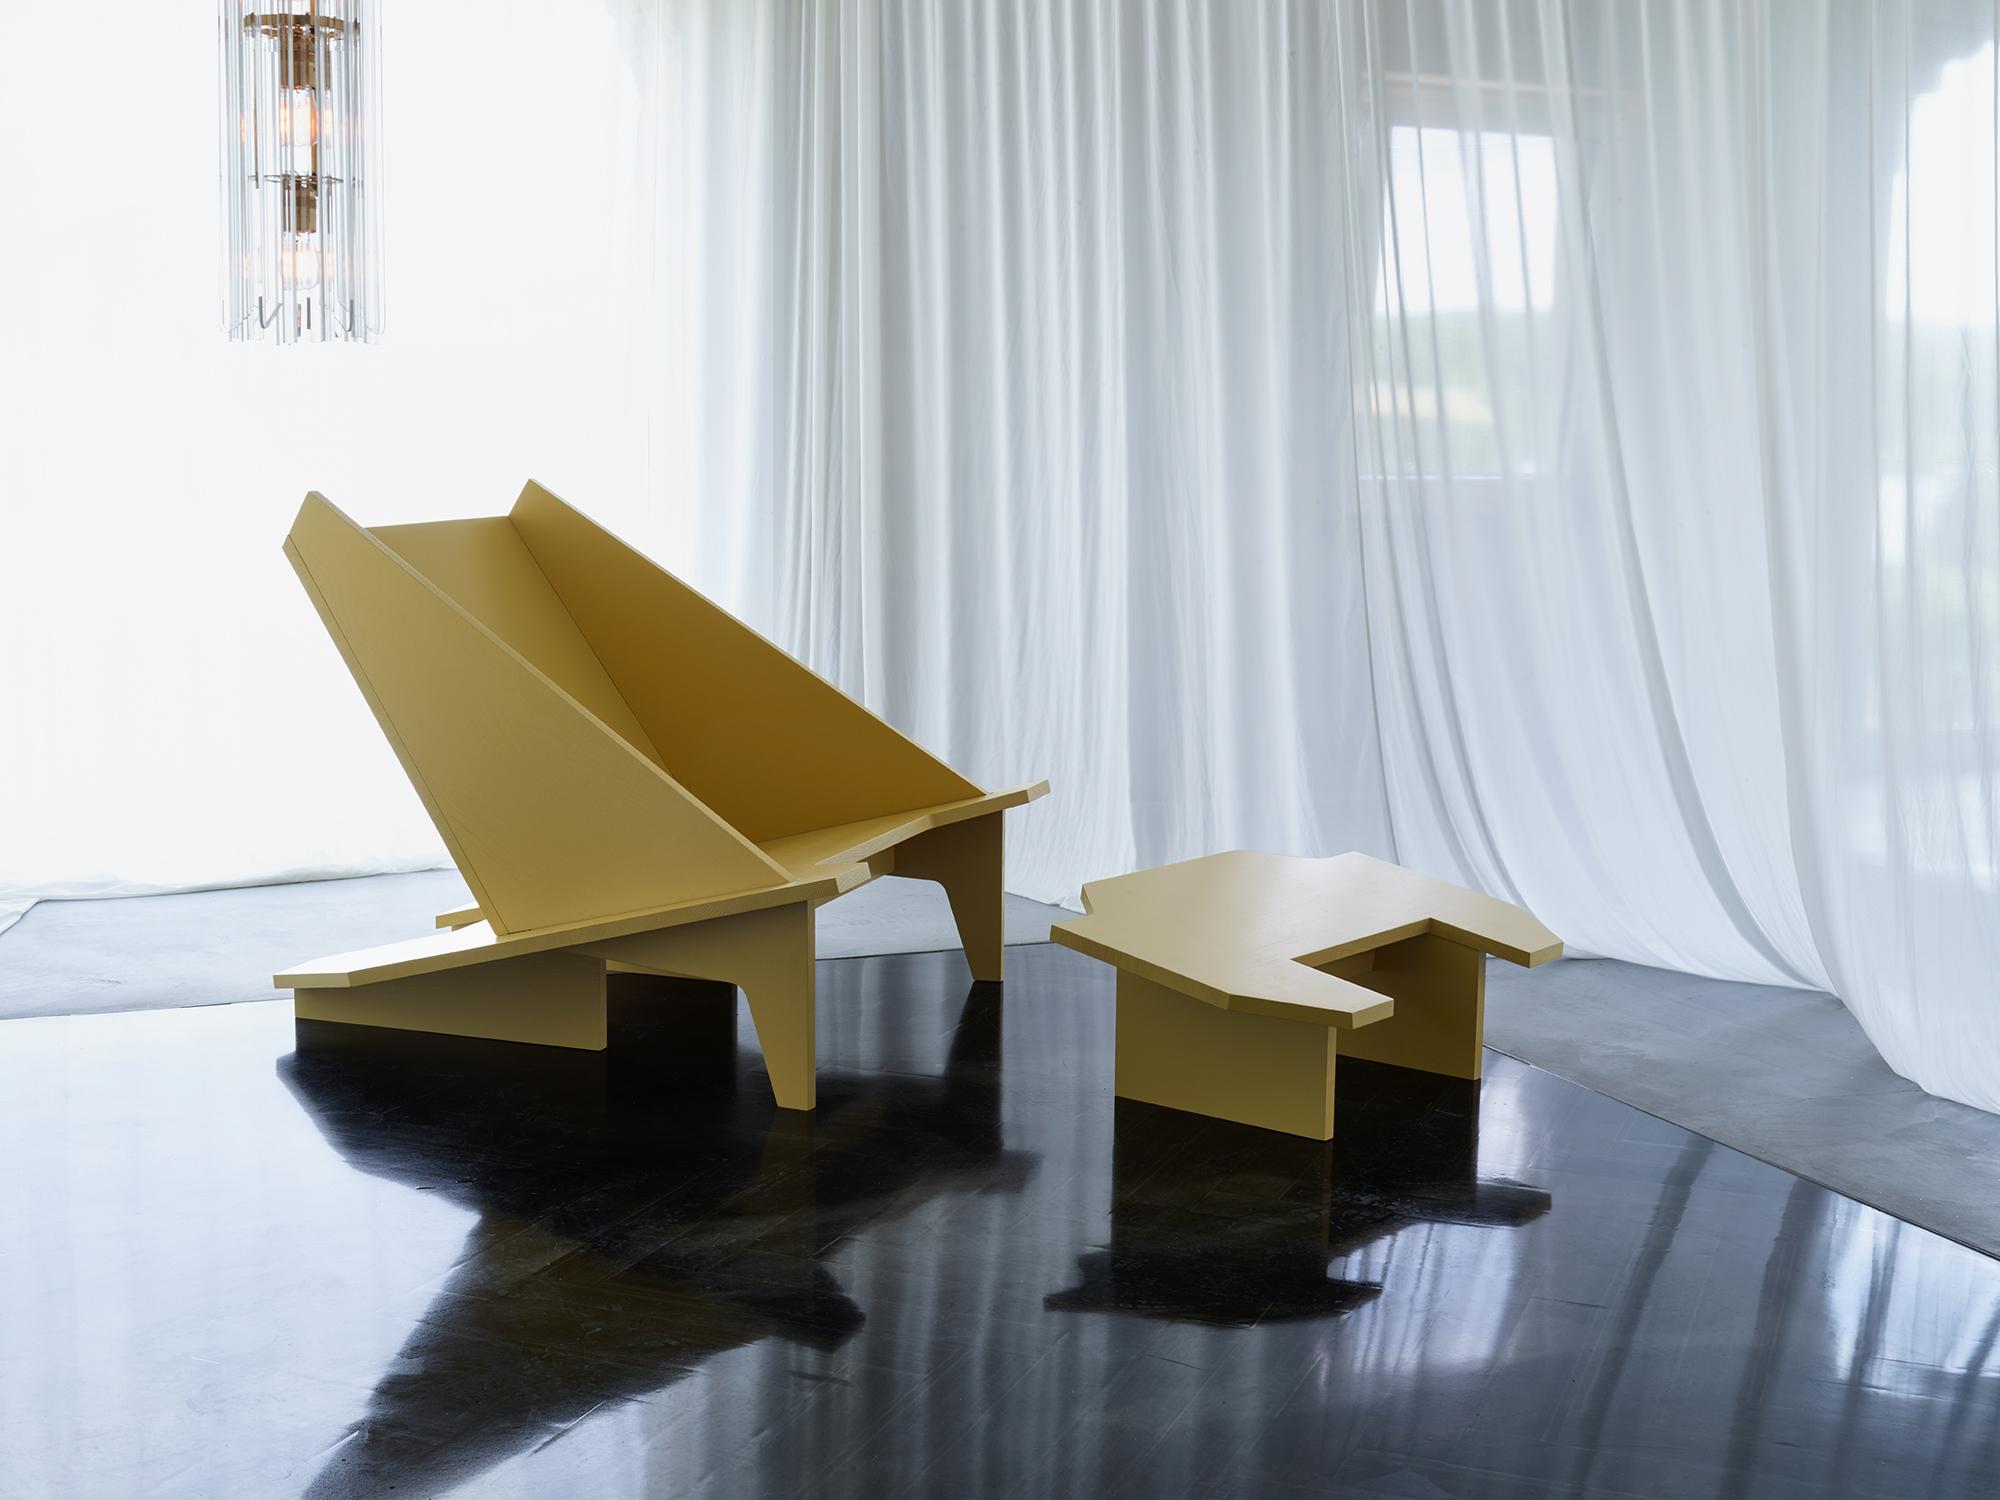 objekte-unserer-tage-3407-villa-21-takahashi-lounge-chair